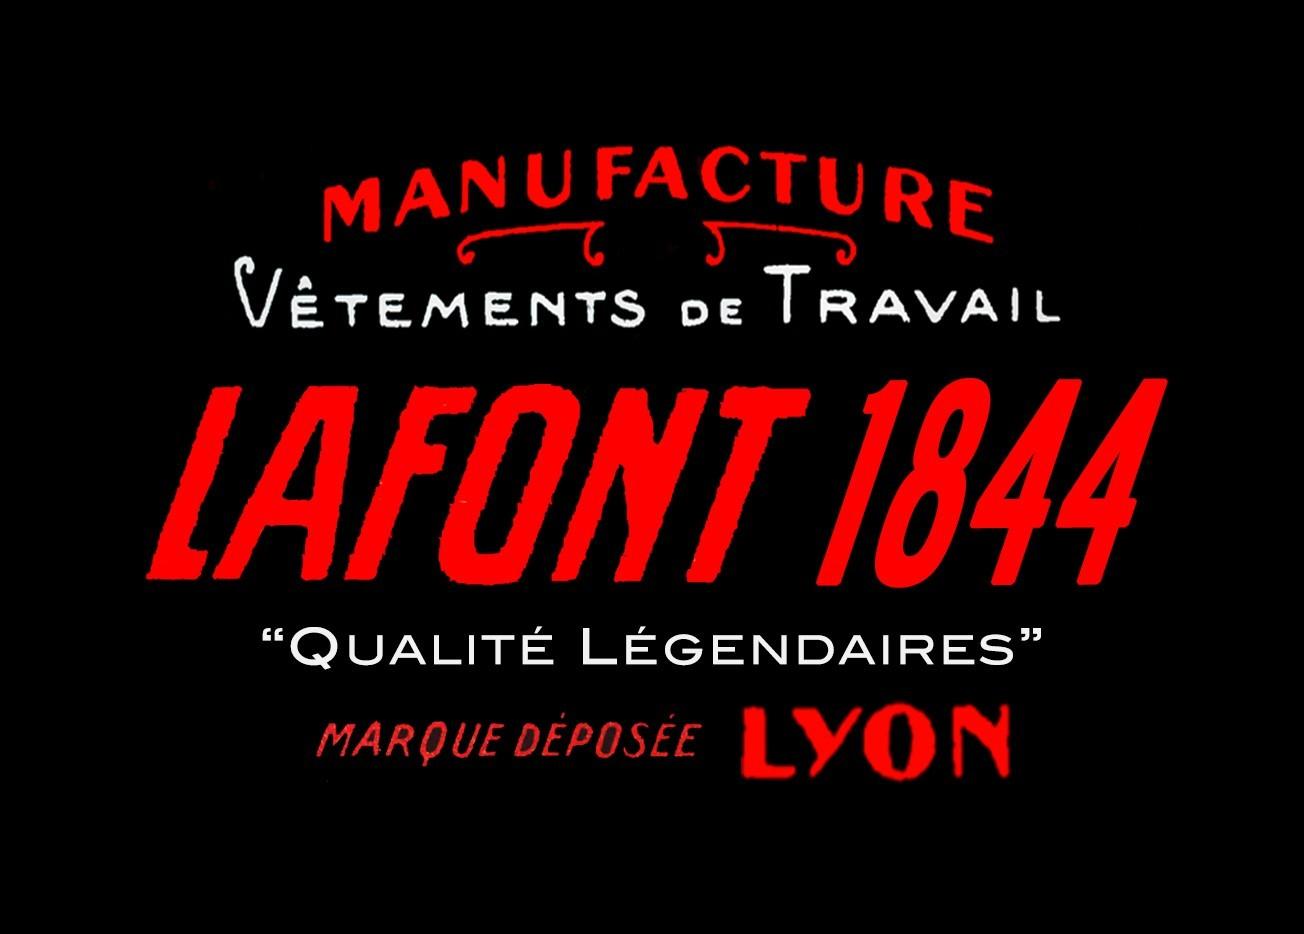 LAFONT 1844